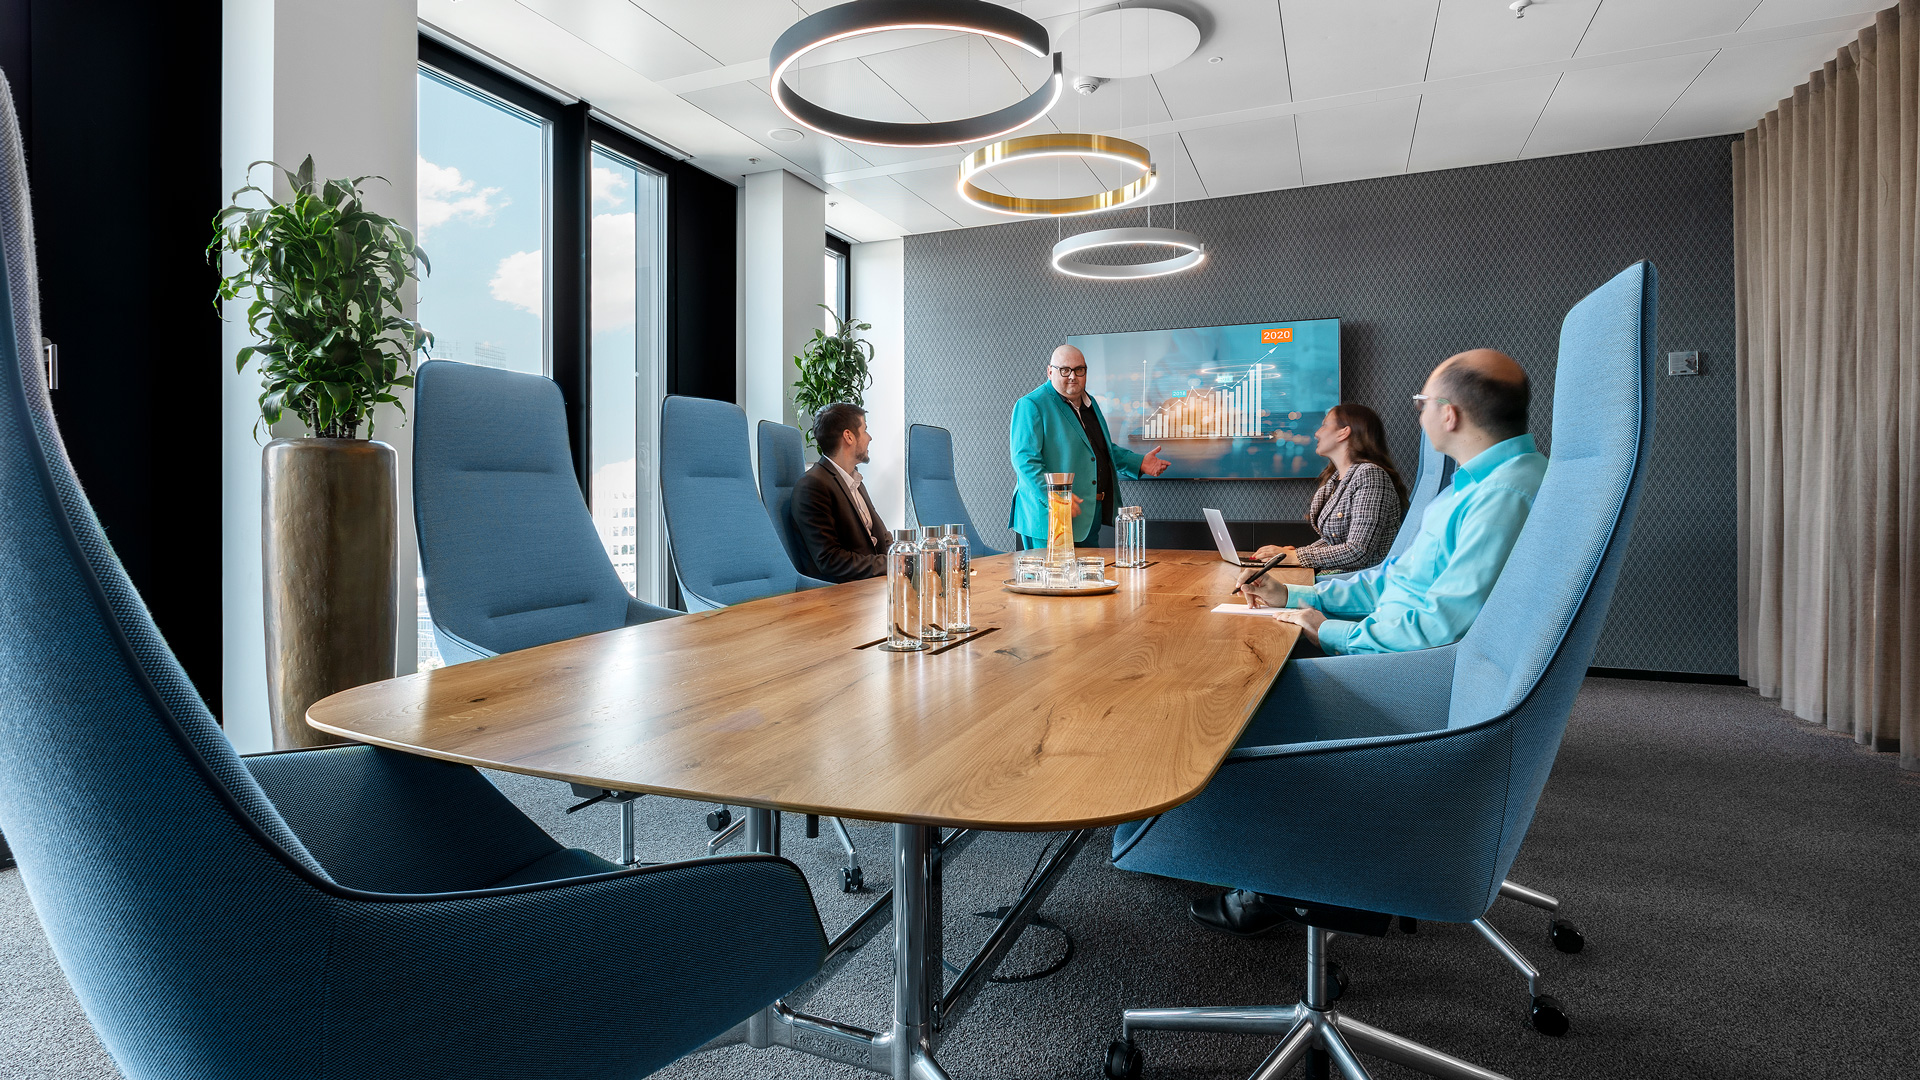 Conferencing Room K1 at WINX Frankfurt